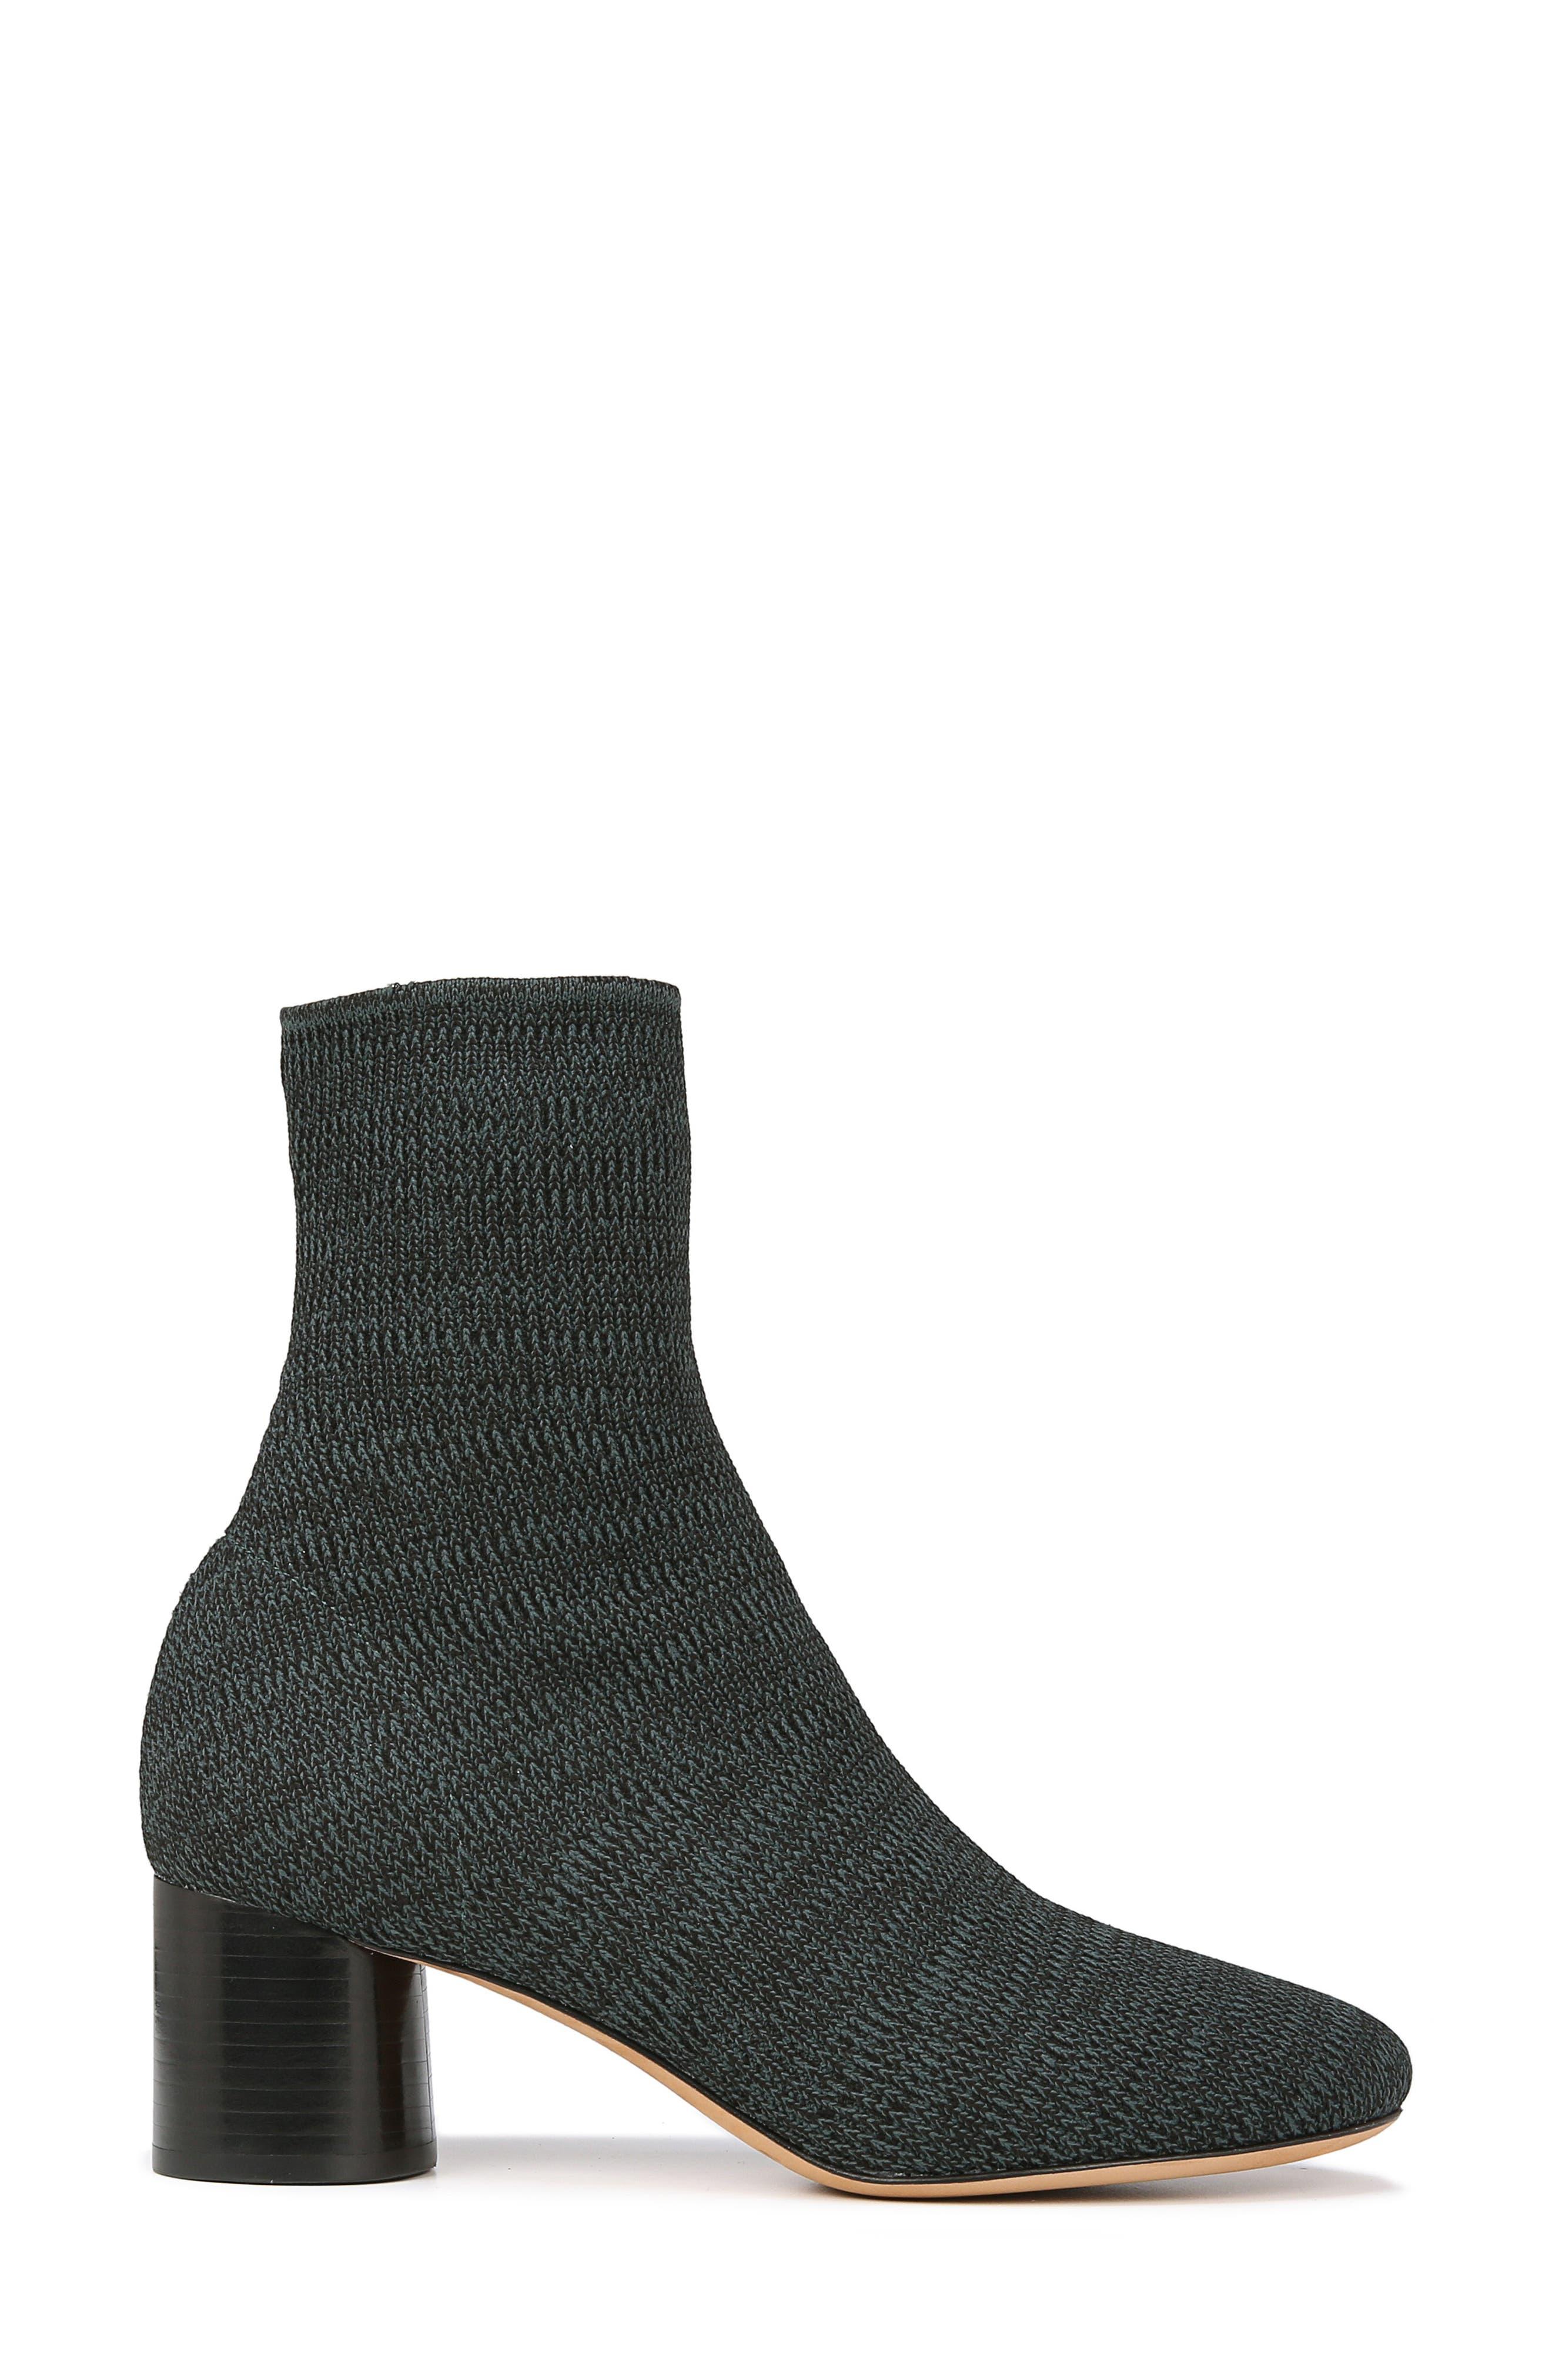 Tasha Sock Bootie,                             Alternate thumbnail 3, color,                             JUNIPER